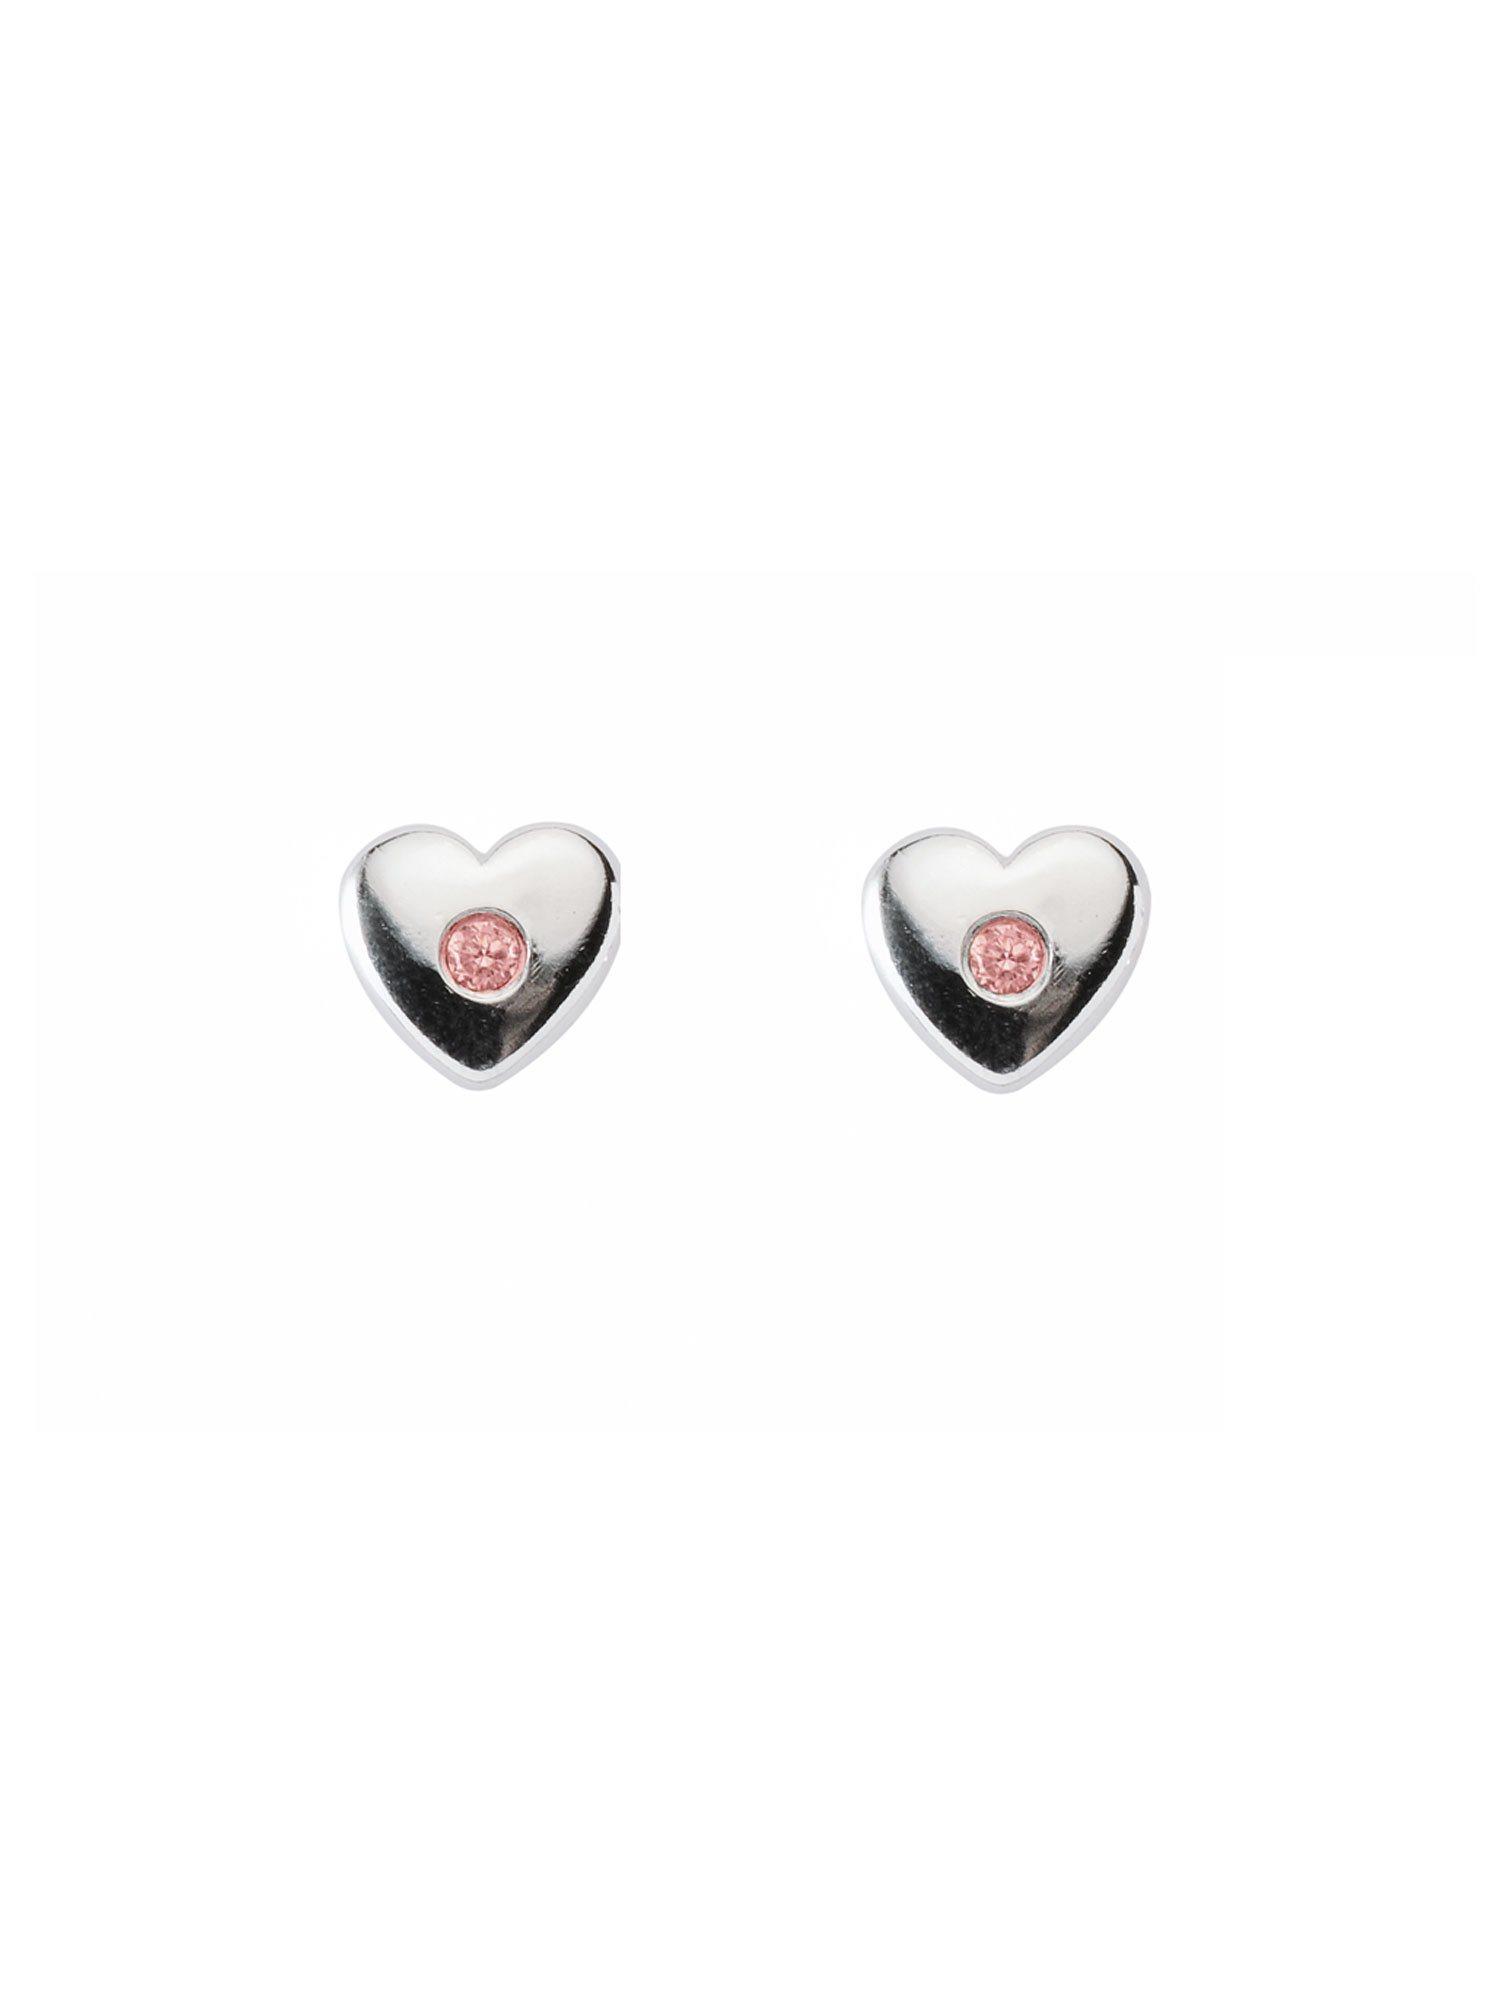 Adelia´s Paar Ohrstecker »Silber Ohrringe« Herz 925 Sterling Silber mit Zirkonia | Schmuck > Ohrschmuck & Ohrringe > Ohrstecker | Rosa | Adelia´s